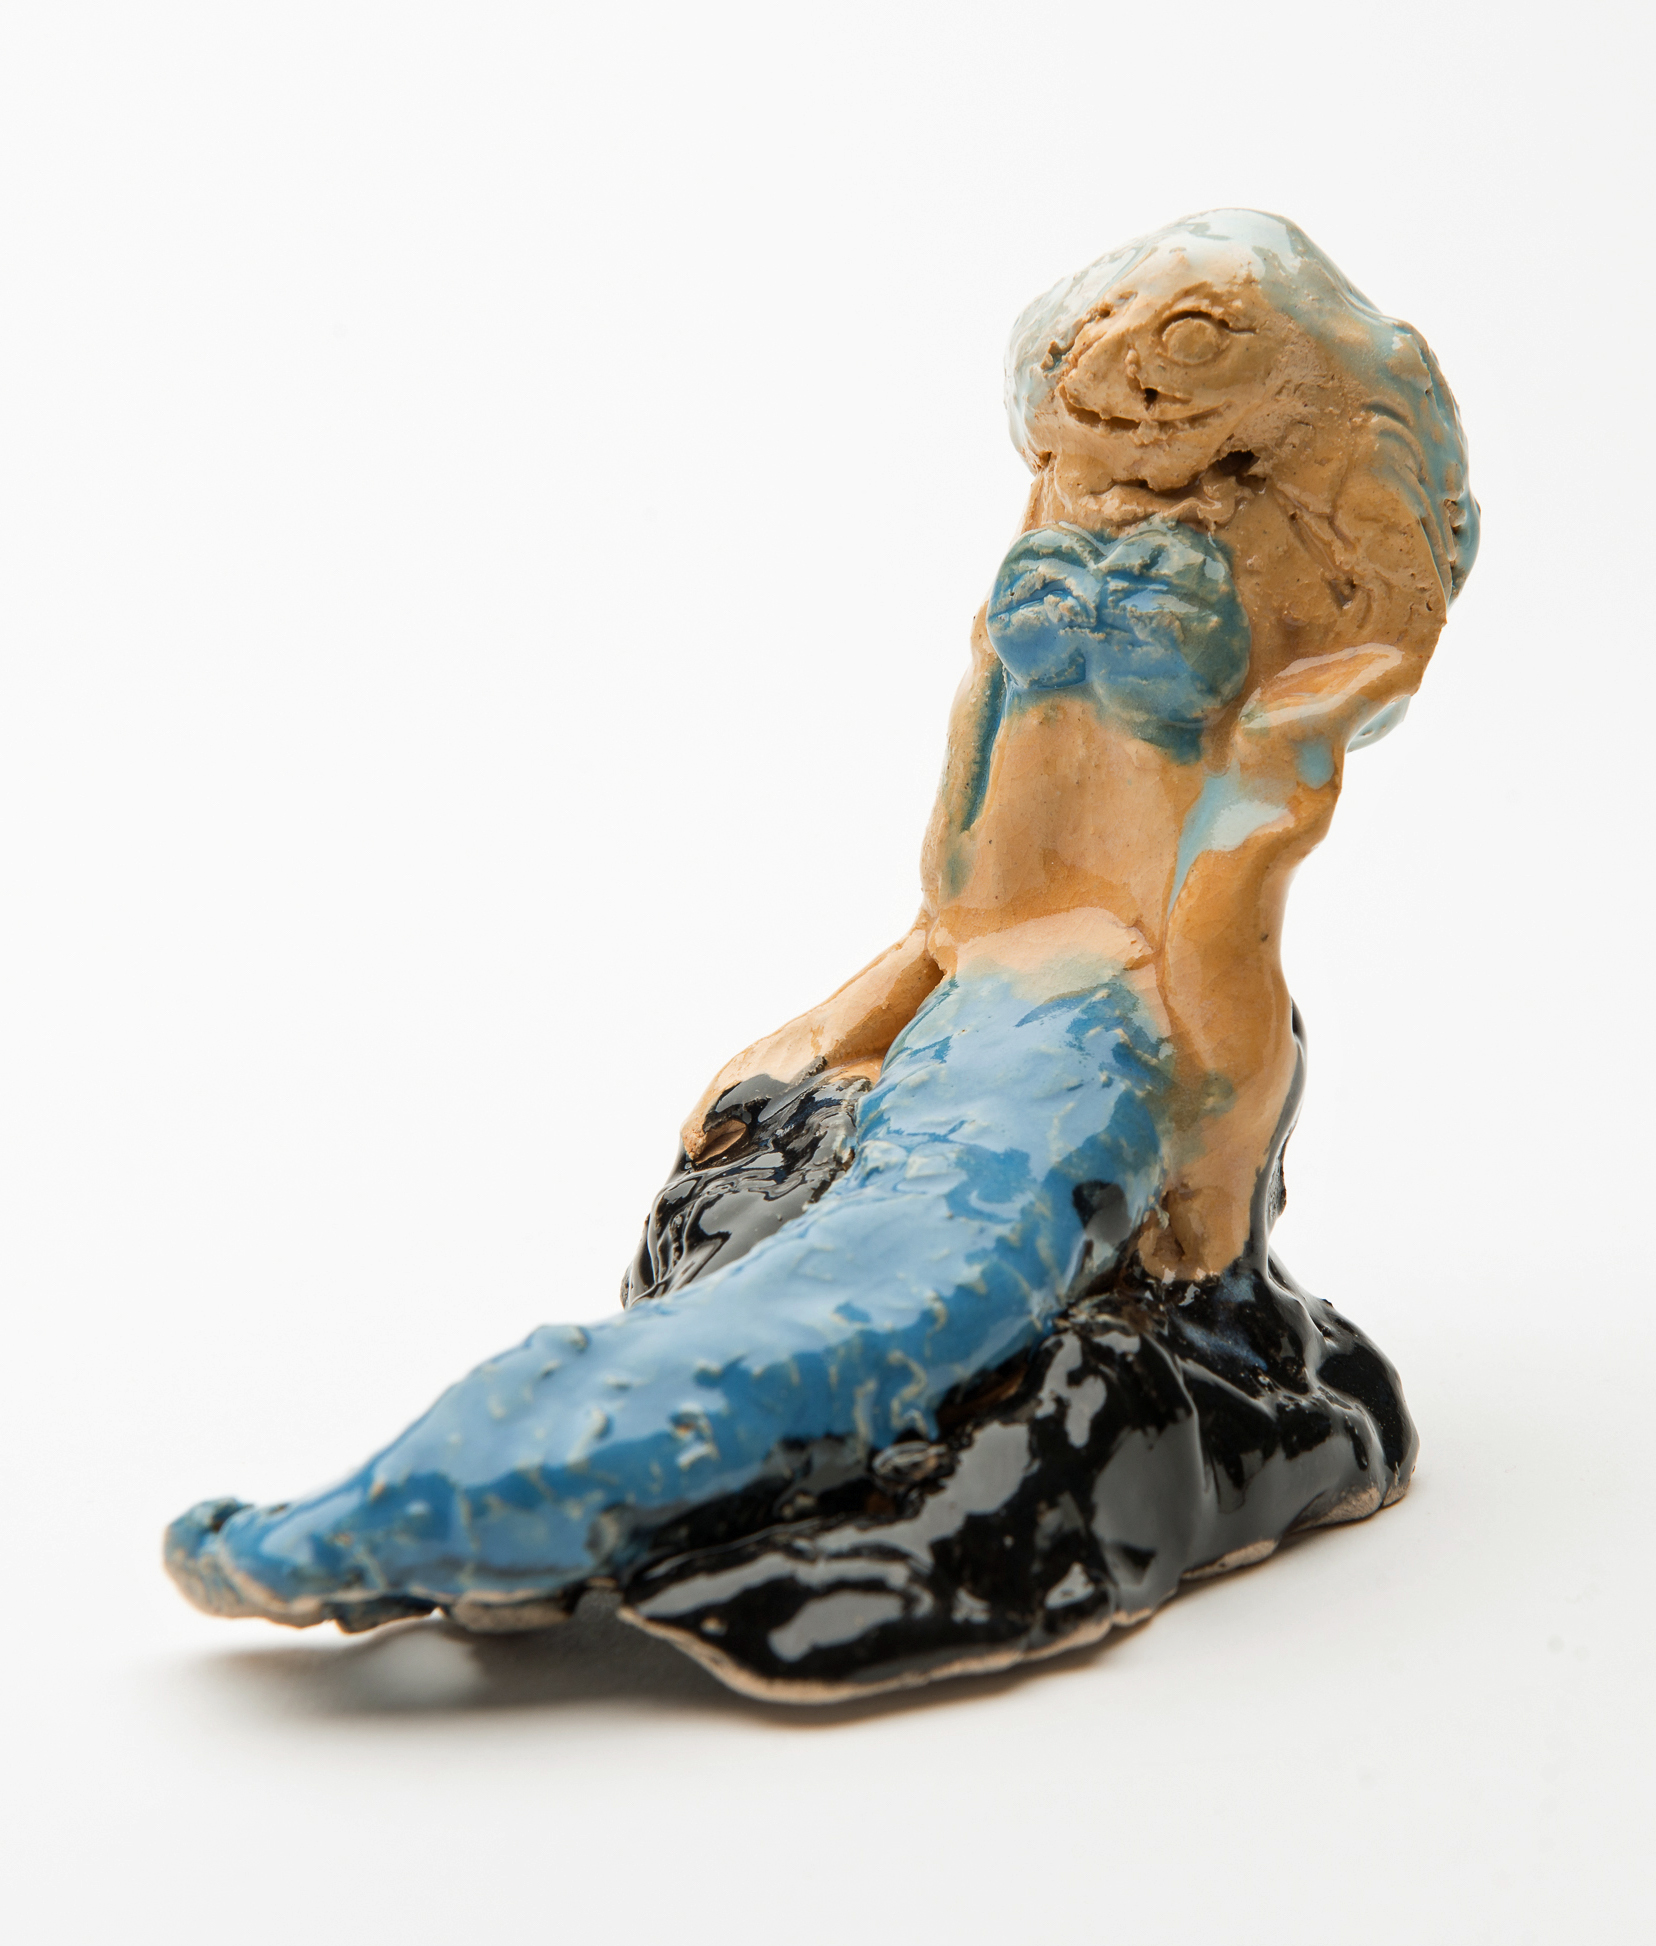 4 Ceramic Mermaid - Kids Like Clay.jpg